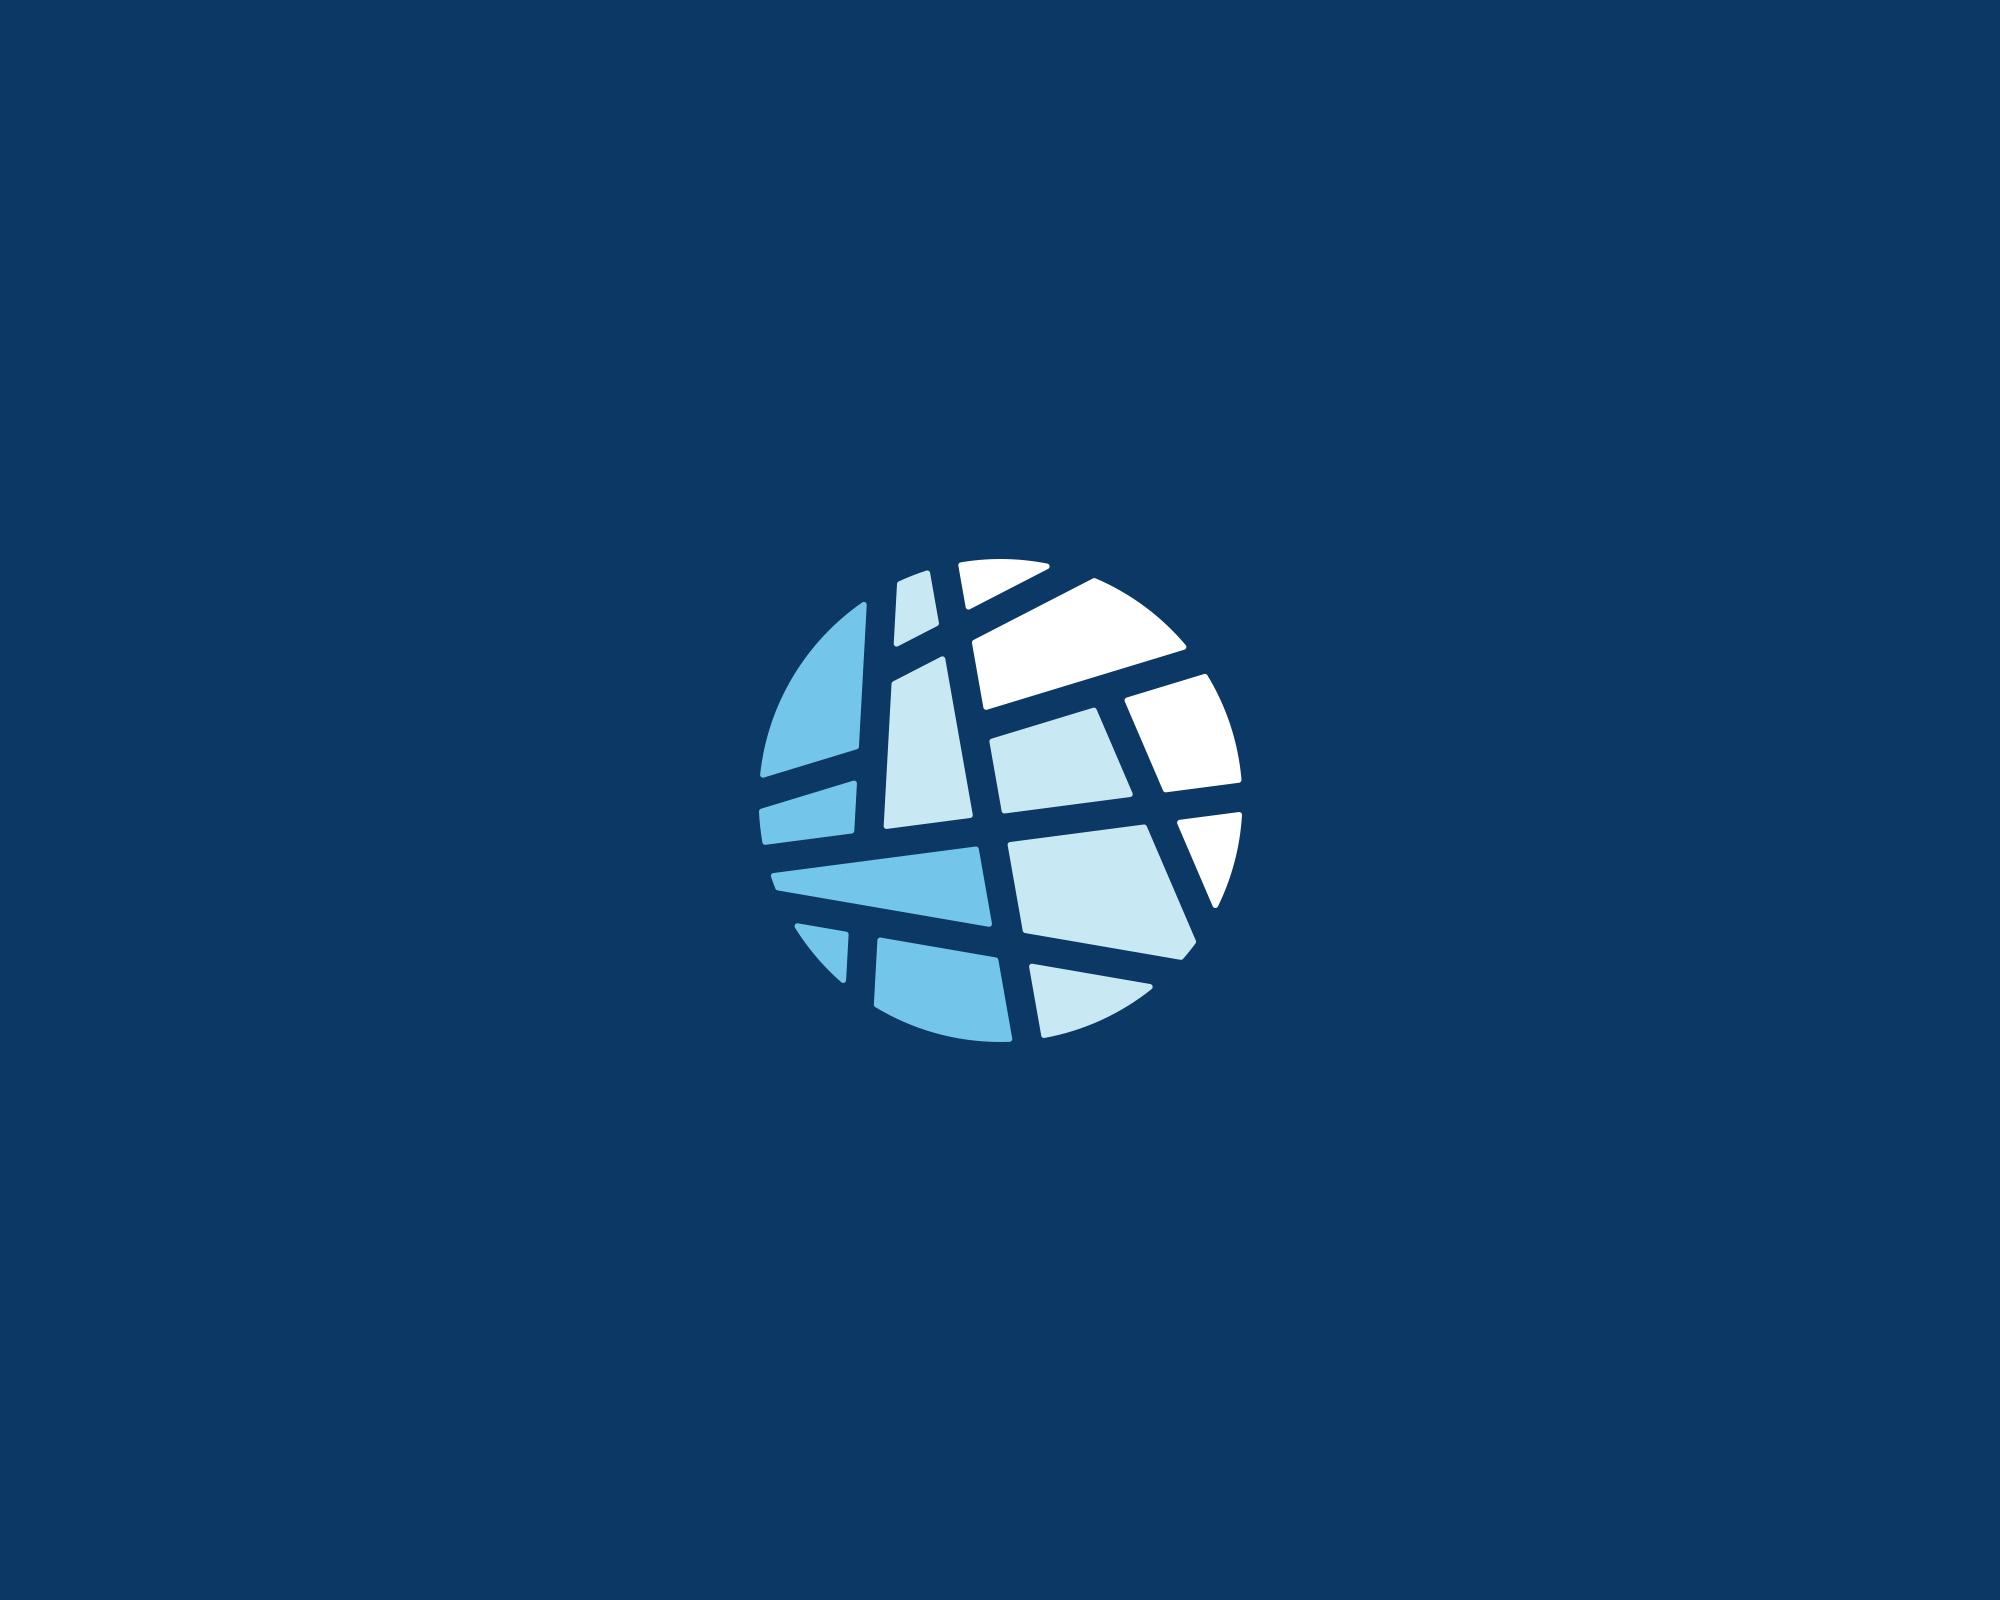 Omni CRA horizontal logo (icon only) on dark background